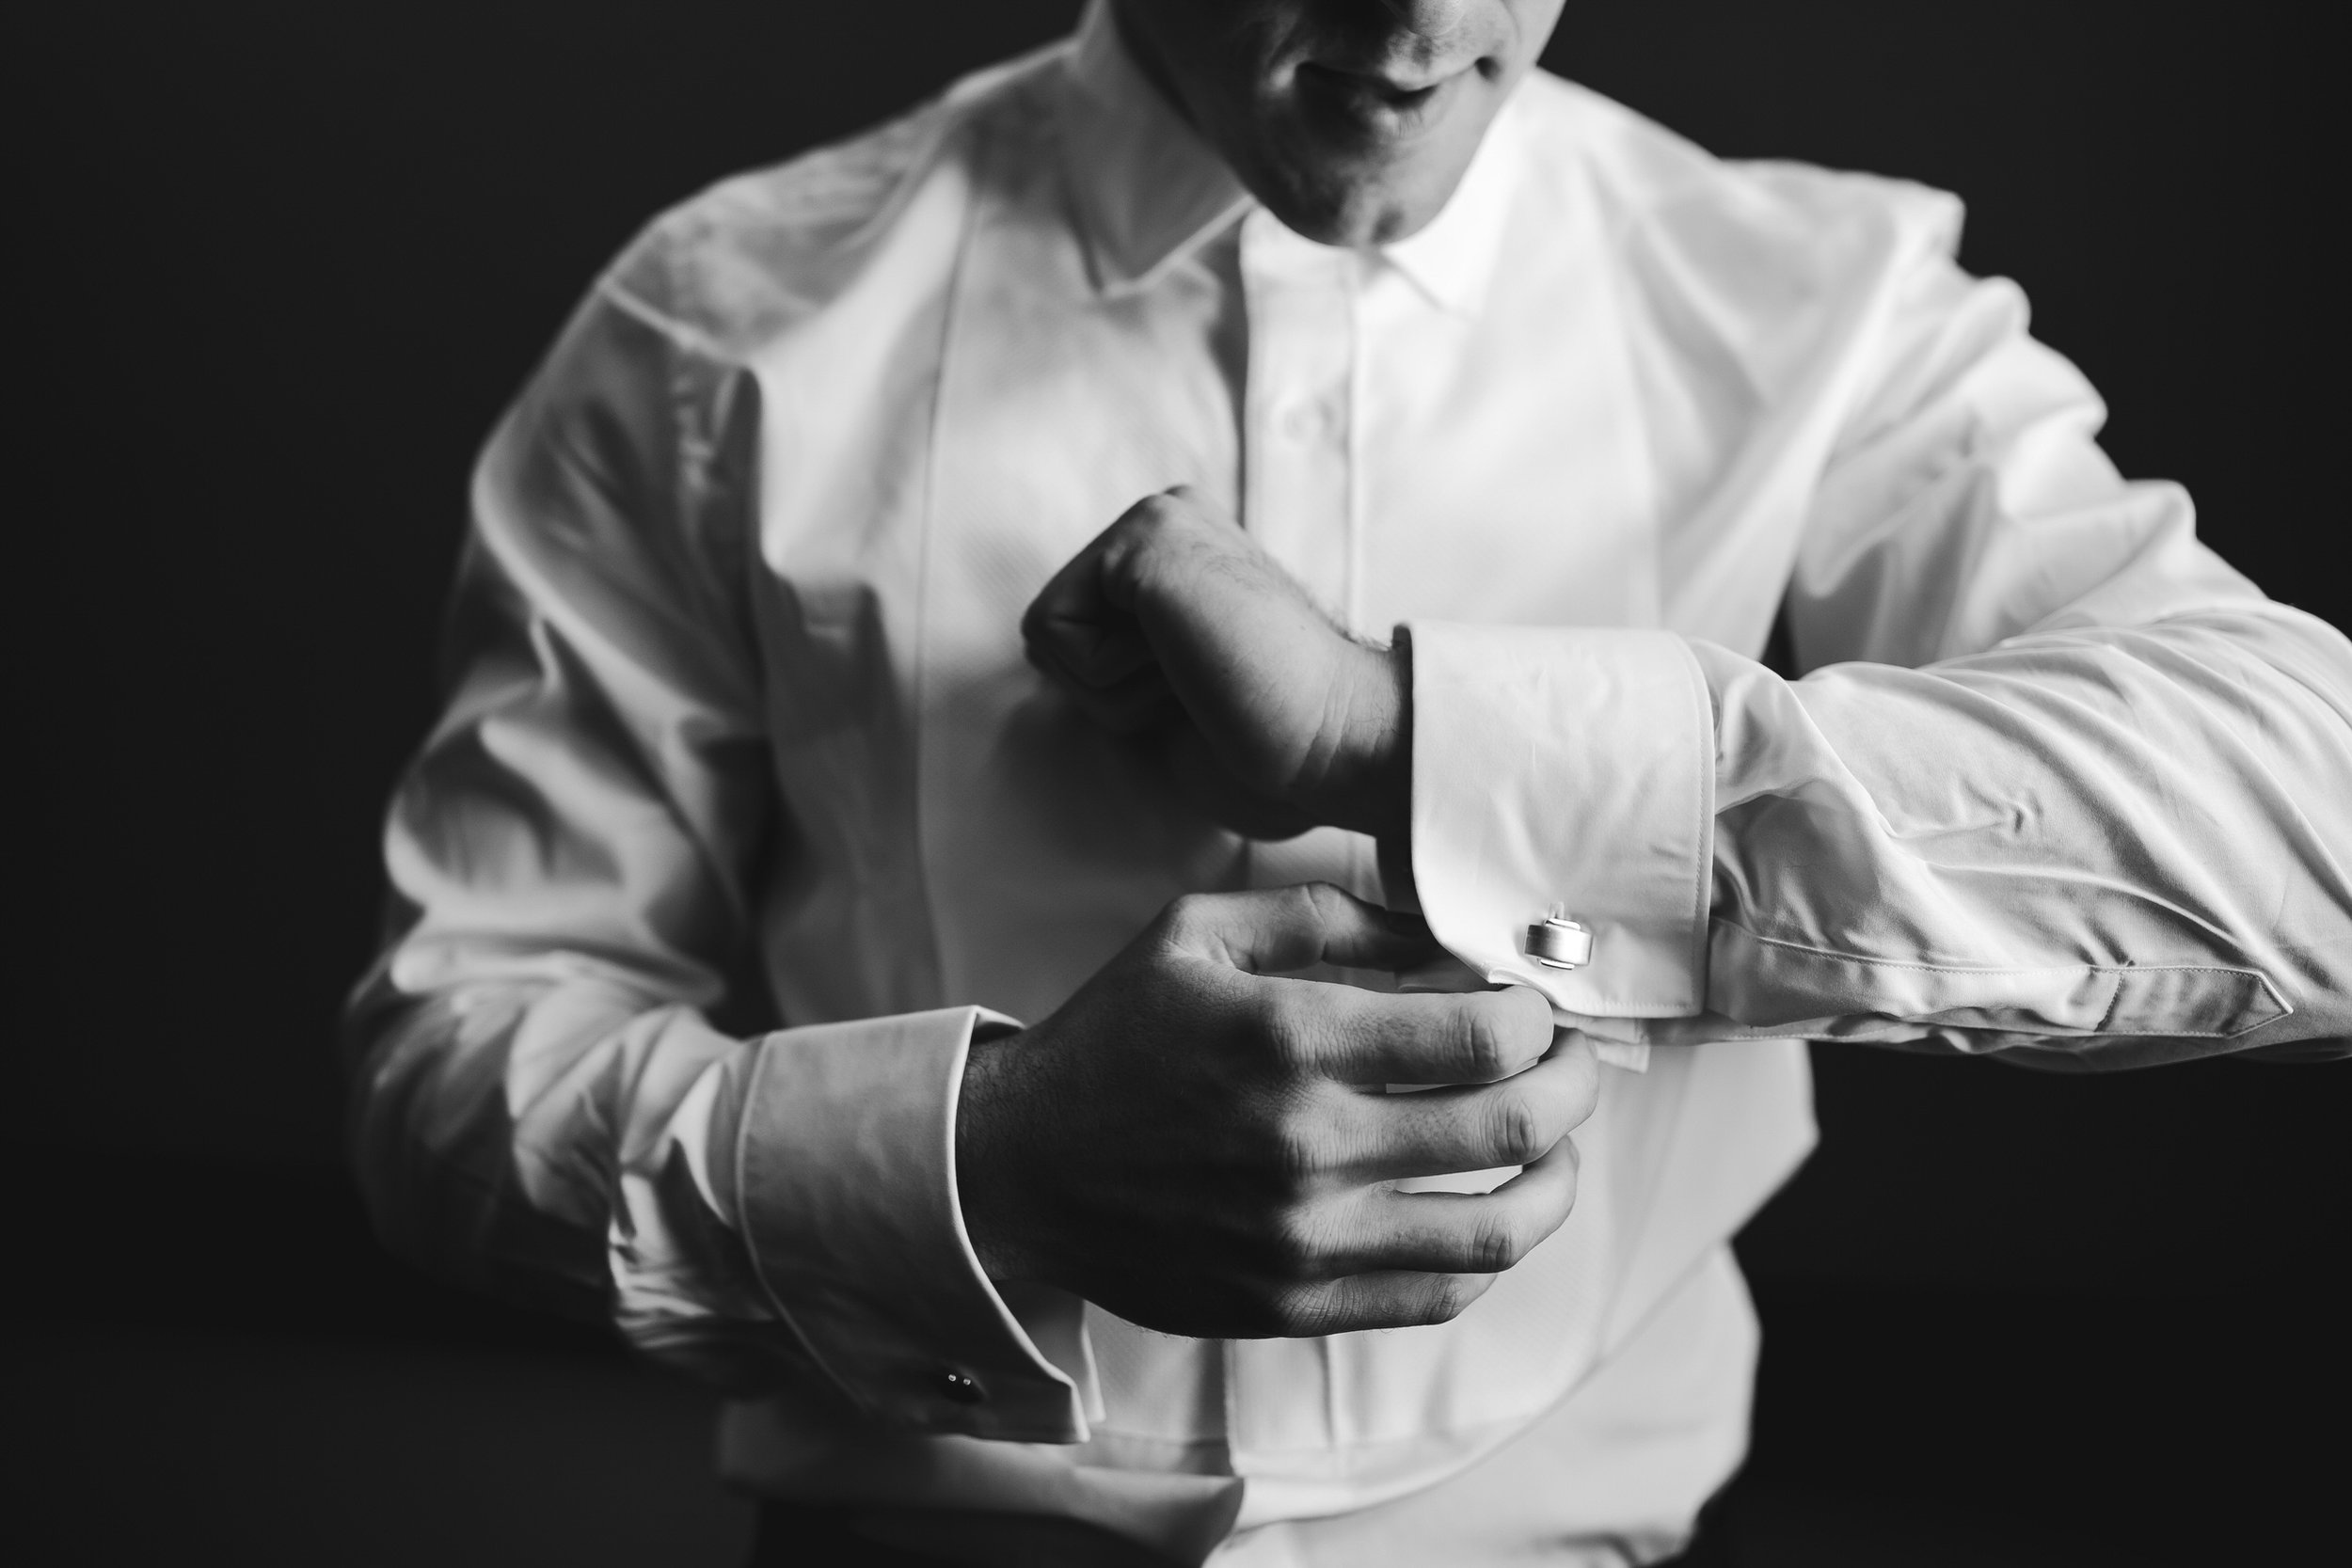 biltmore-wedding-groom-getting-ready-steph-lynn-photo-miami-10.jpg